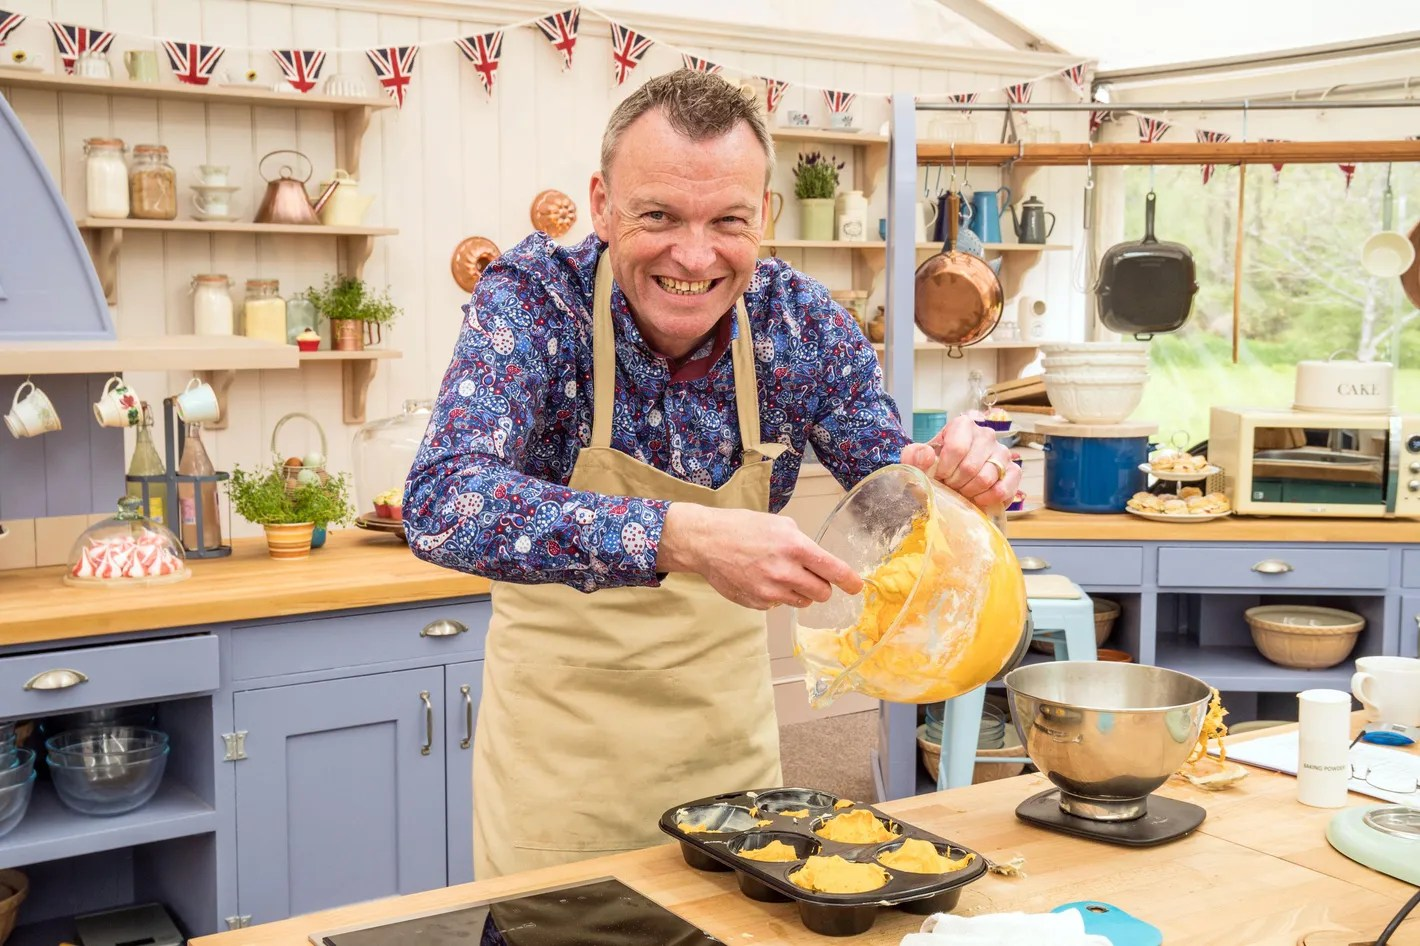 Dining New British Baking On Netflix British Baking Show Season 5 Netflix Contestants British Baking Show Season 5 Review nice food Great British Baking Show Season 5